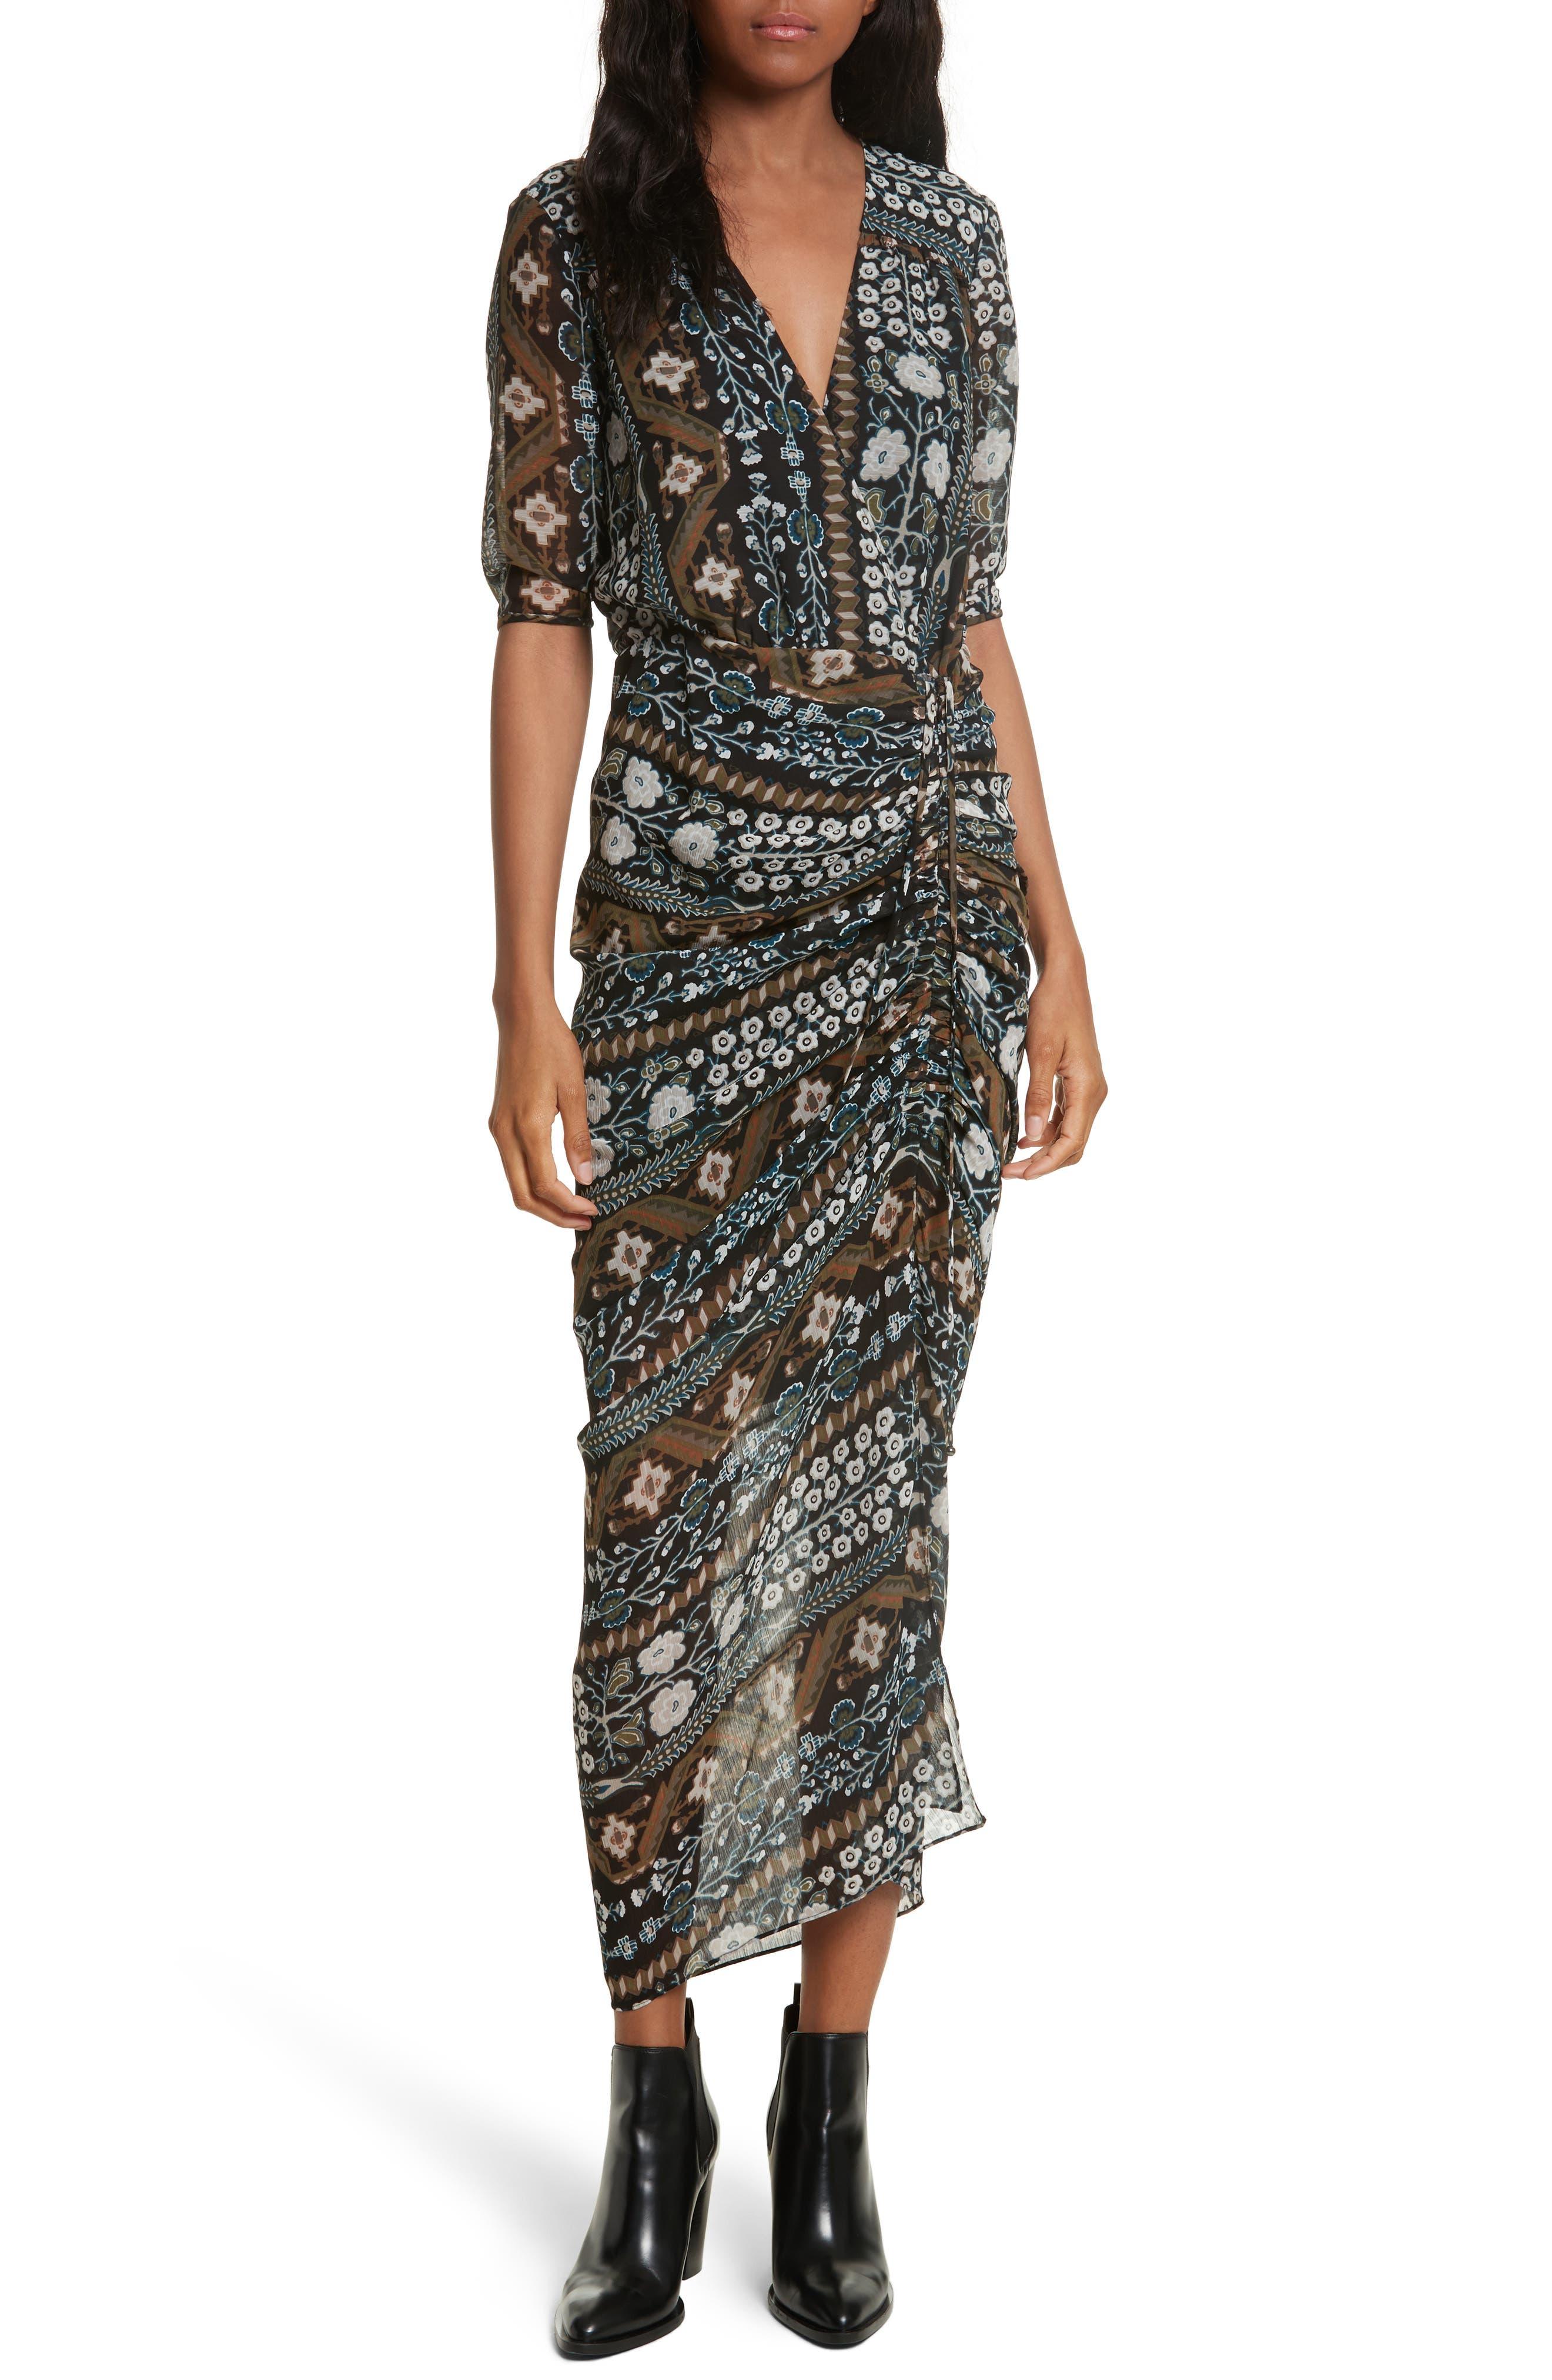 Veronica Beard Perla Ruched Midi Dress